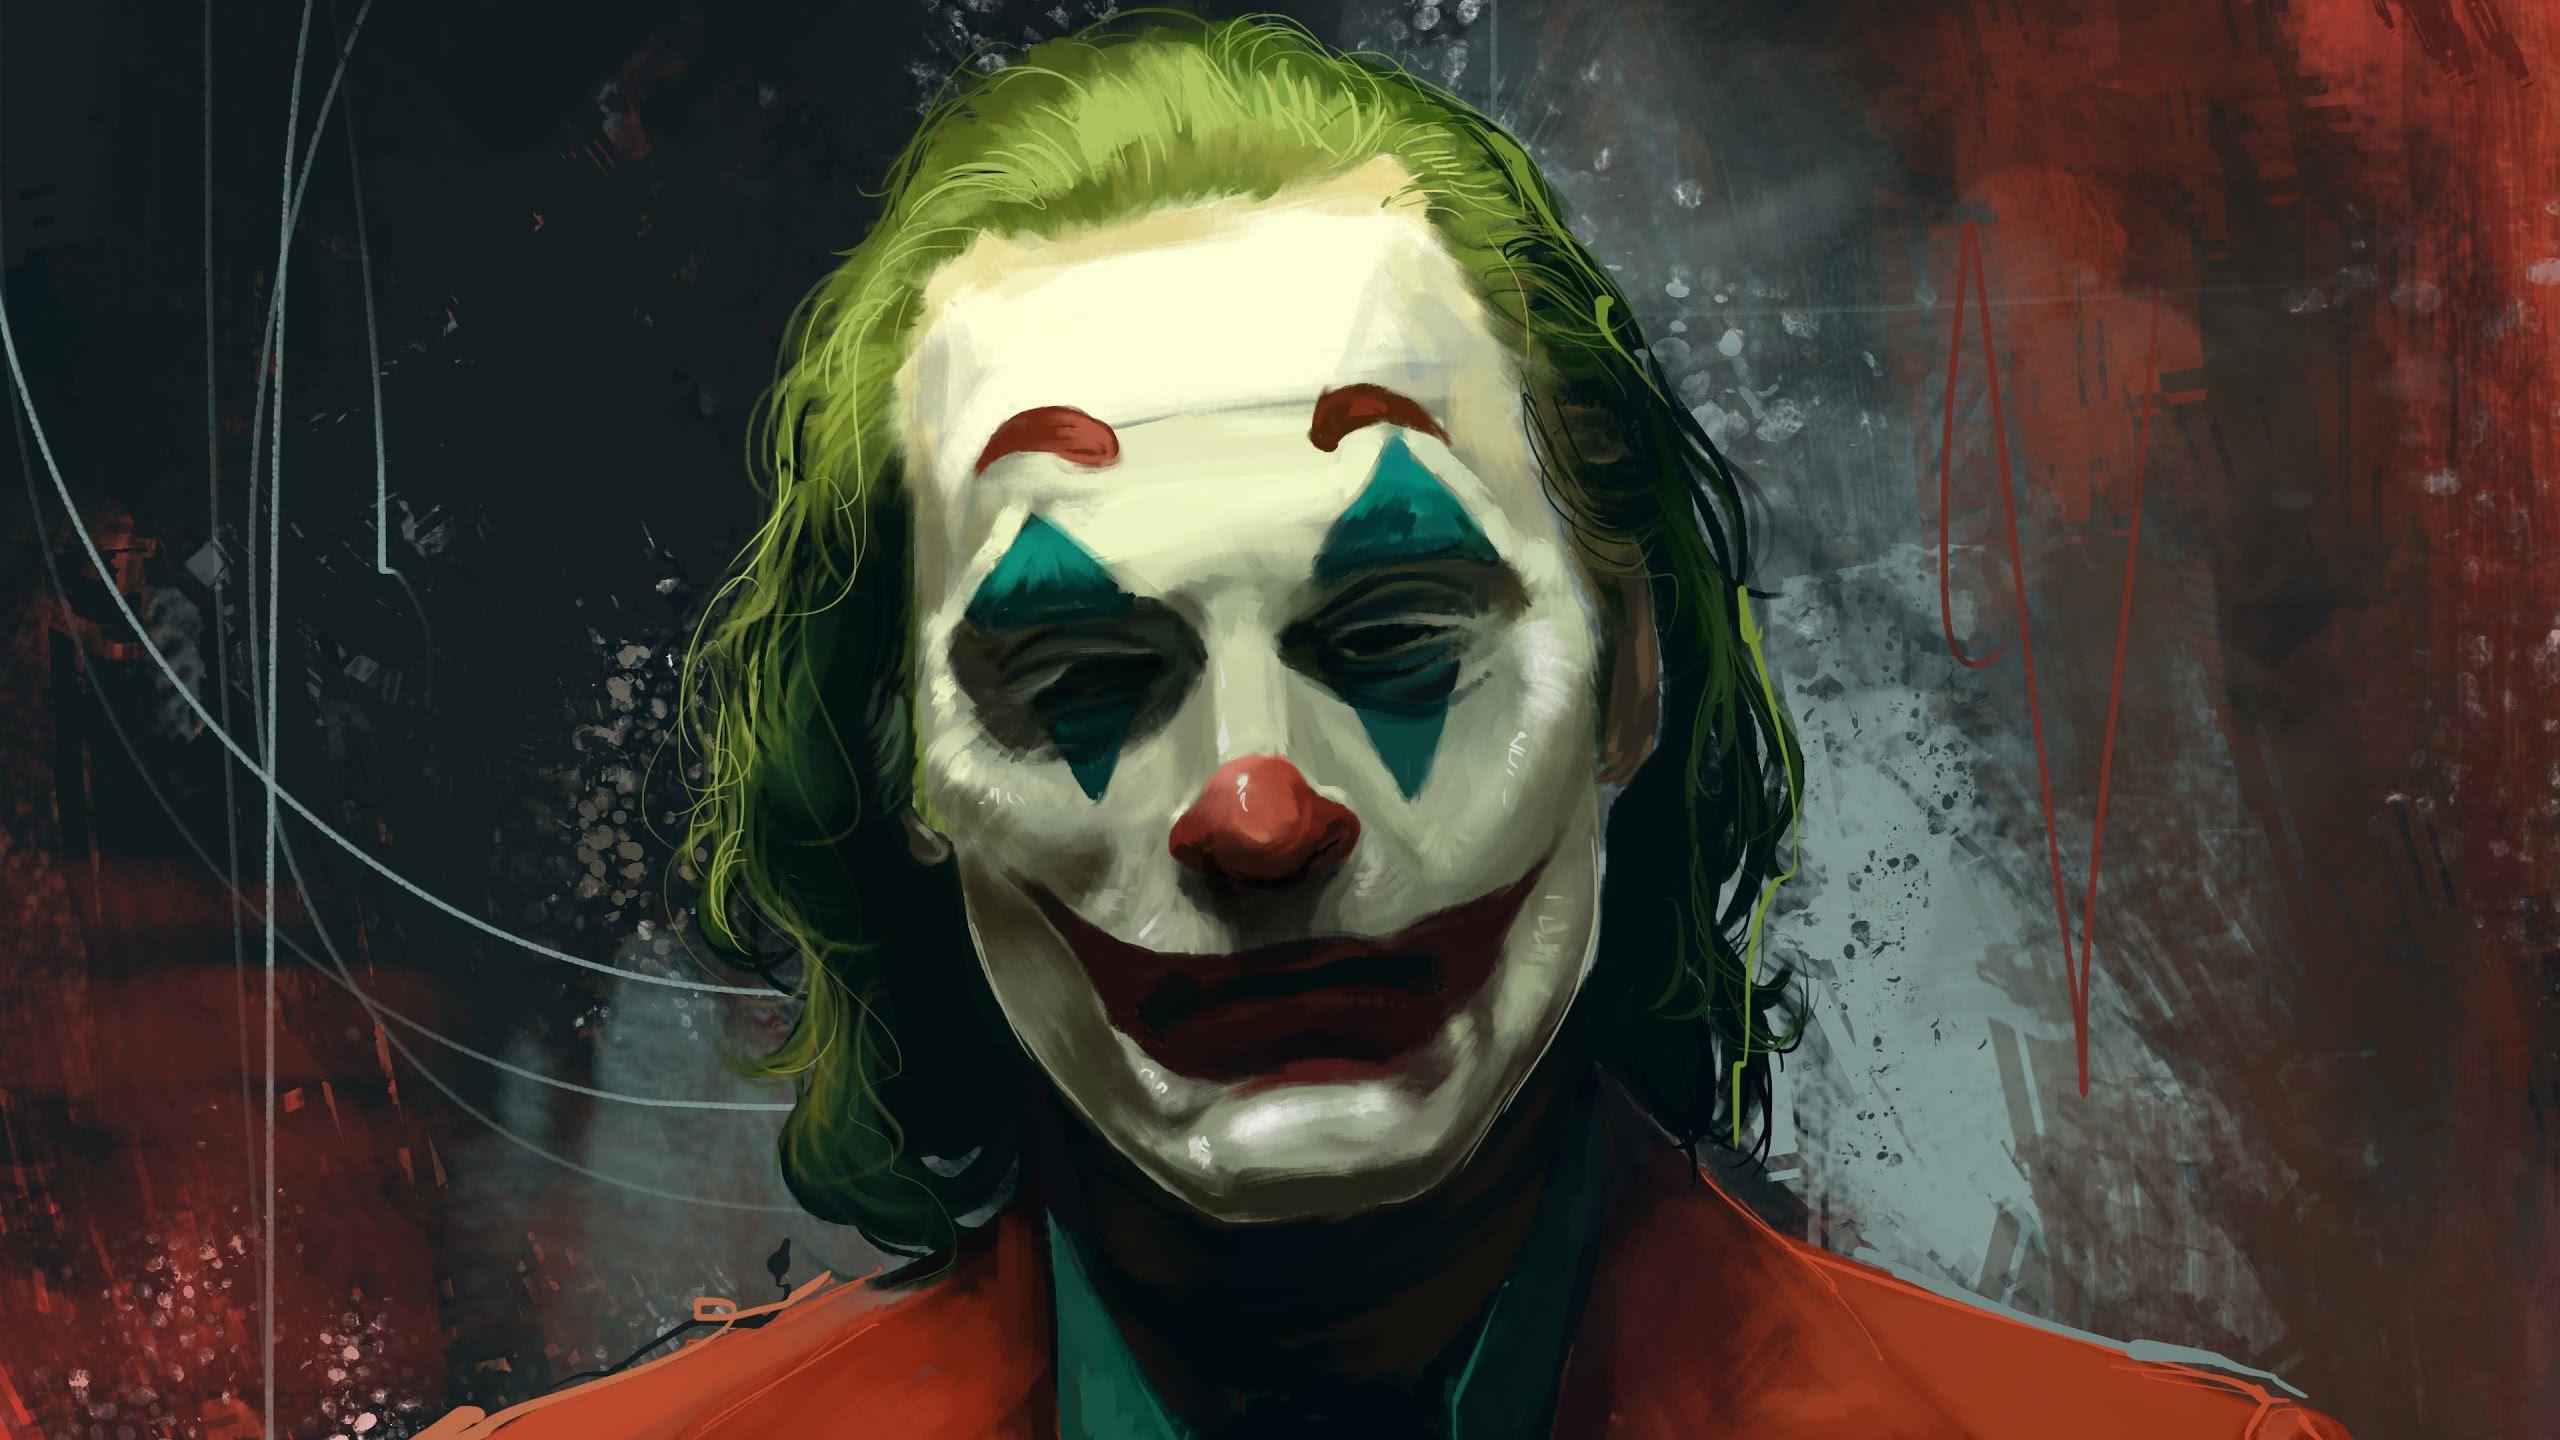 38297 Coringa Joker 3d Wallpaper 1920 X 1080